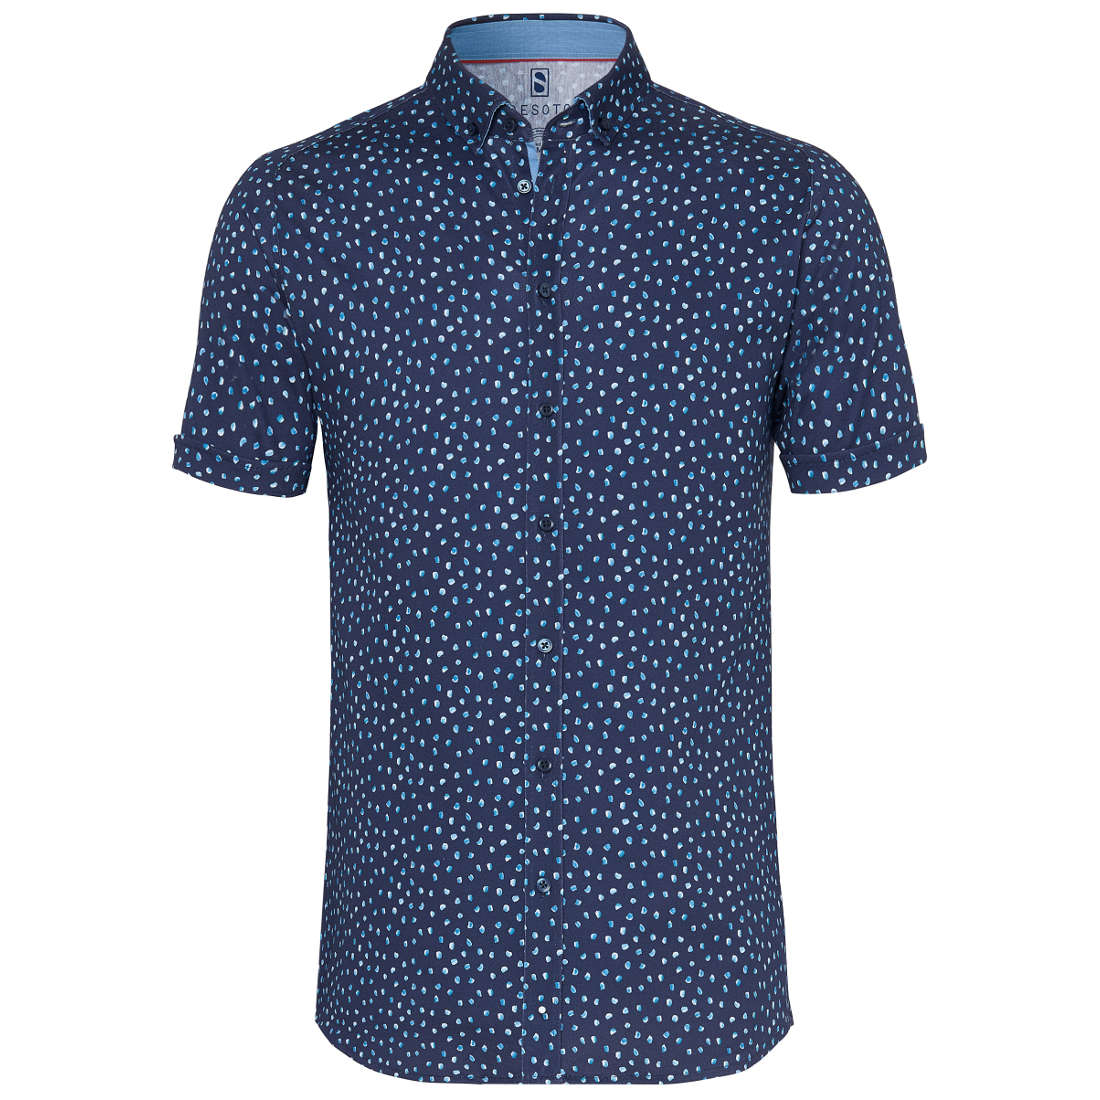 Desoto overhemd Slim Fit 90031-3 in het Donker Blauw